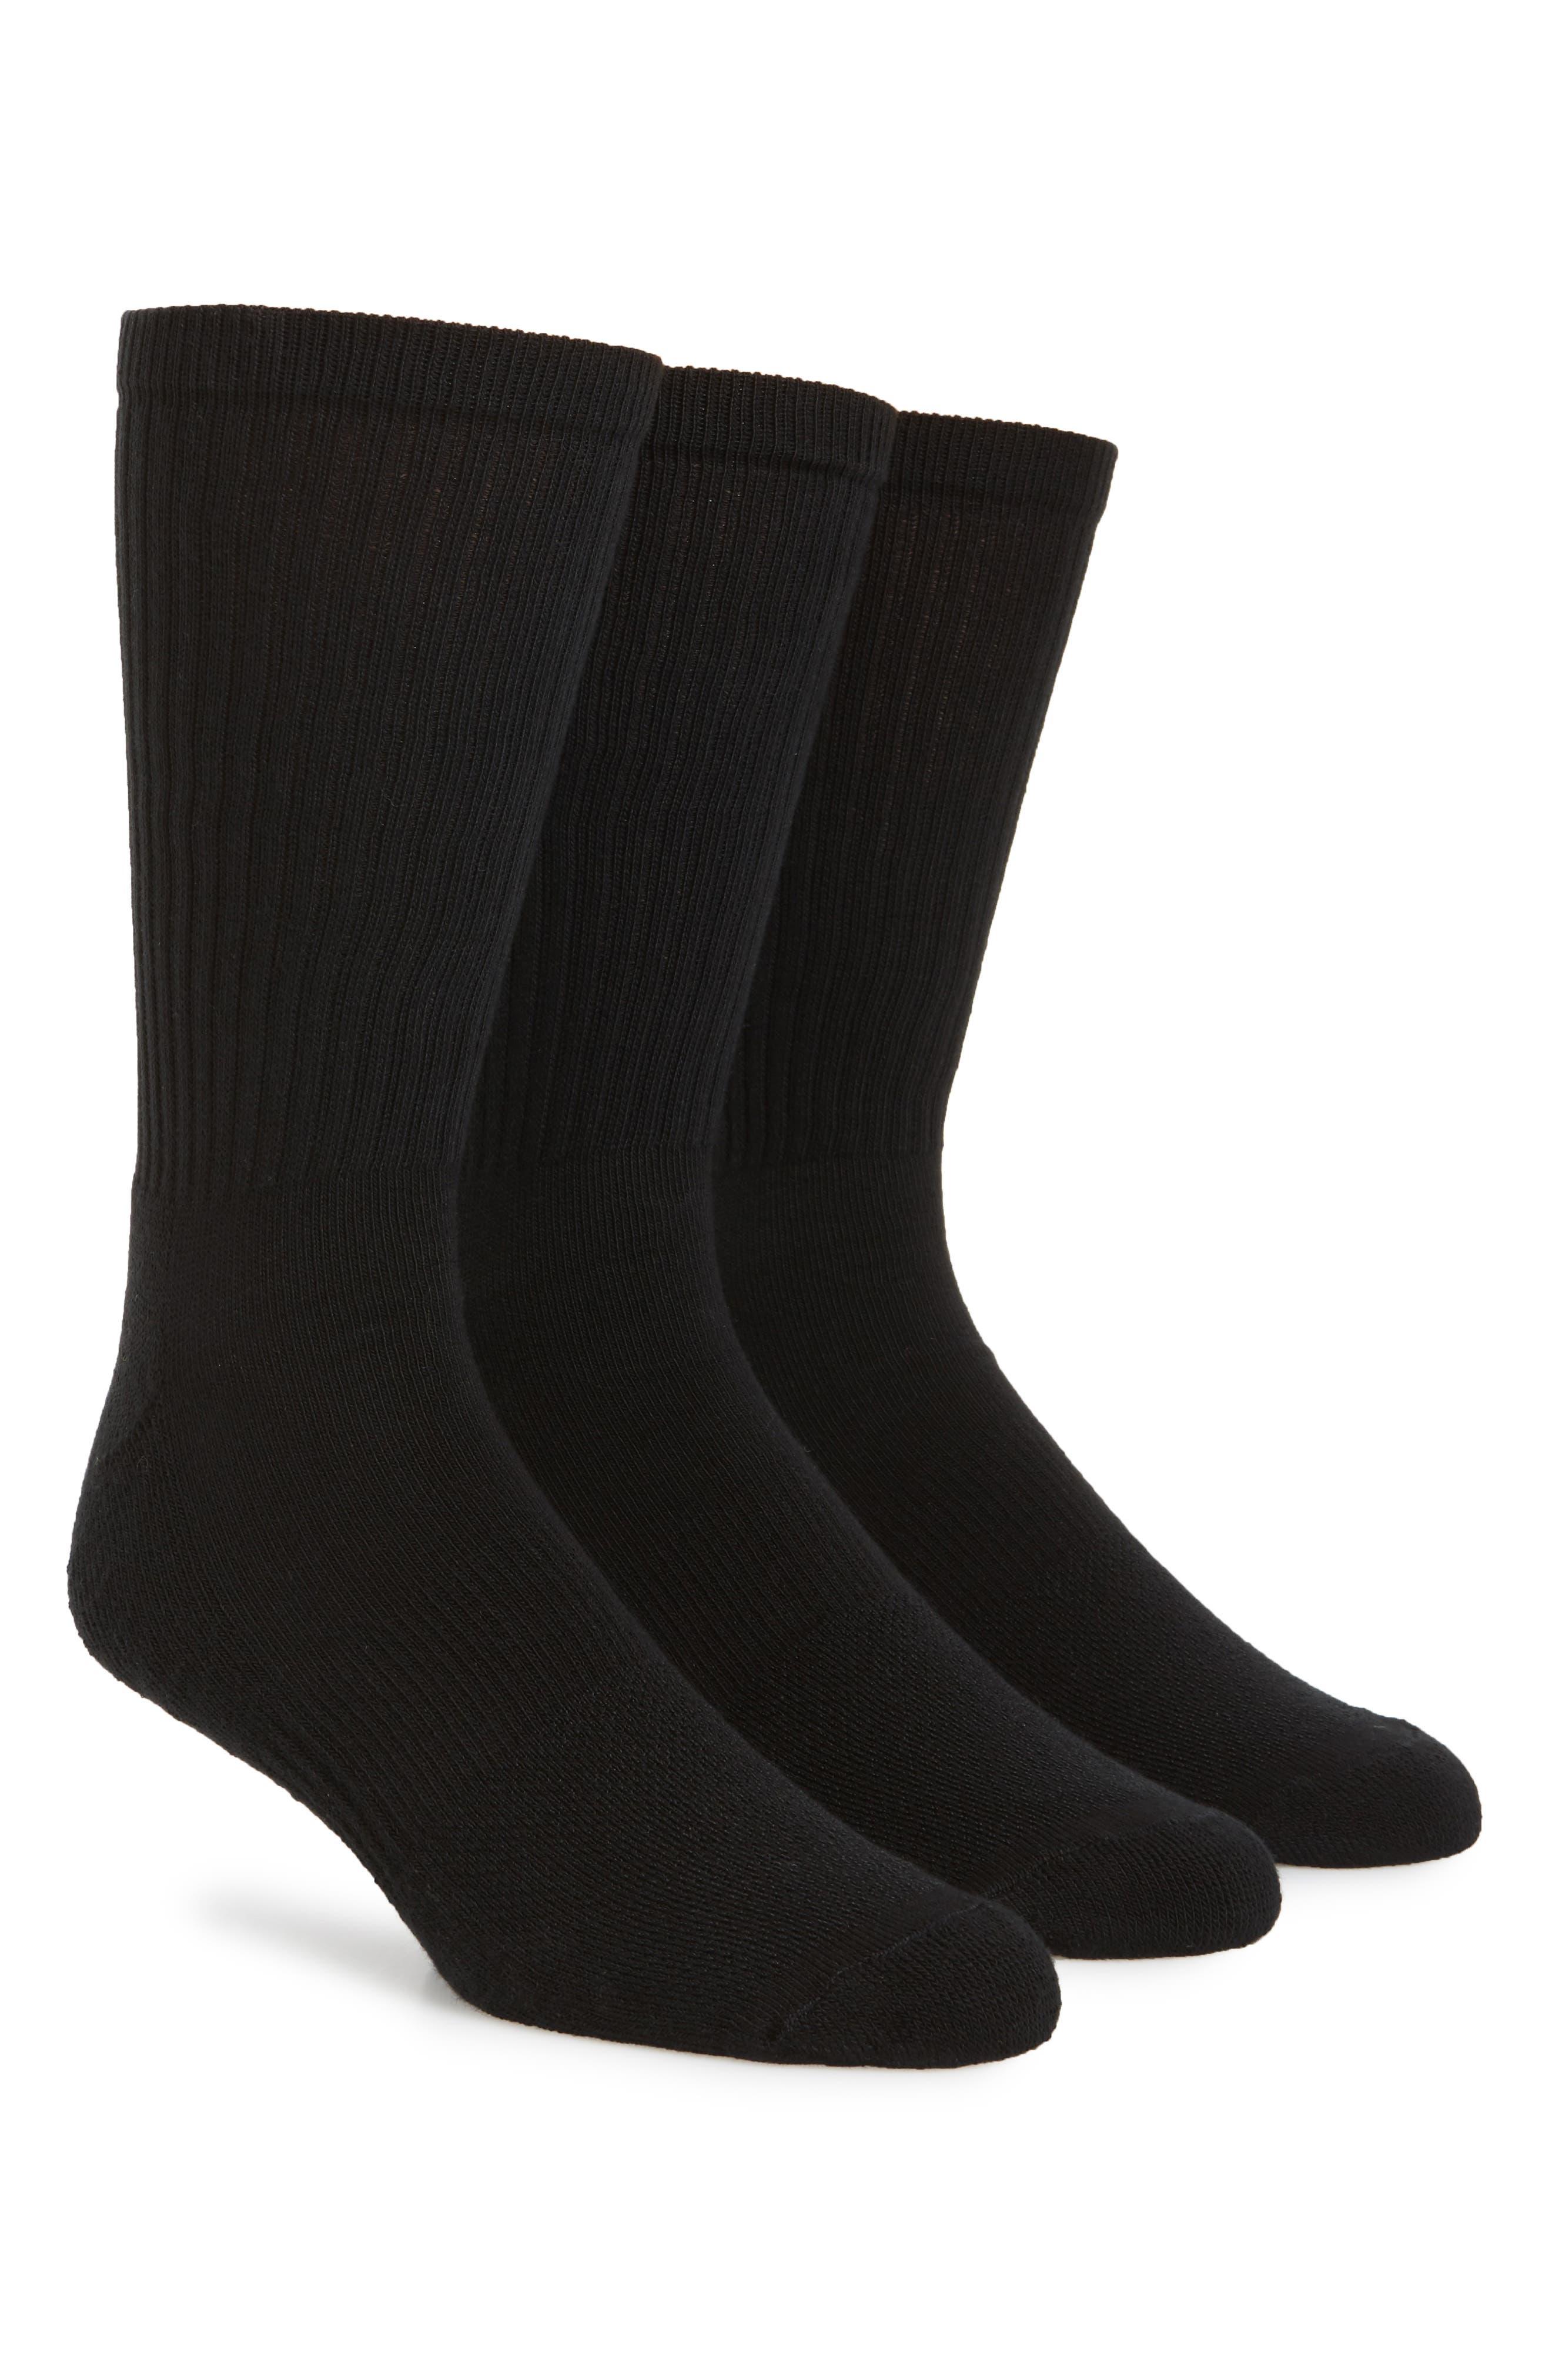 Nordstrom Mens Shop 3-Pack Crew Cut Athletic Socks (Big)